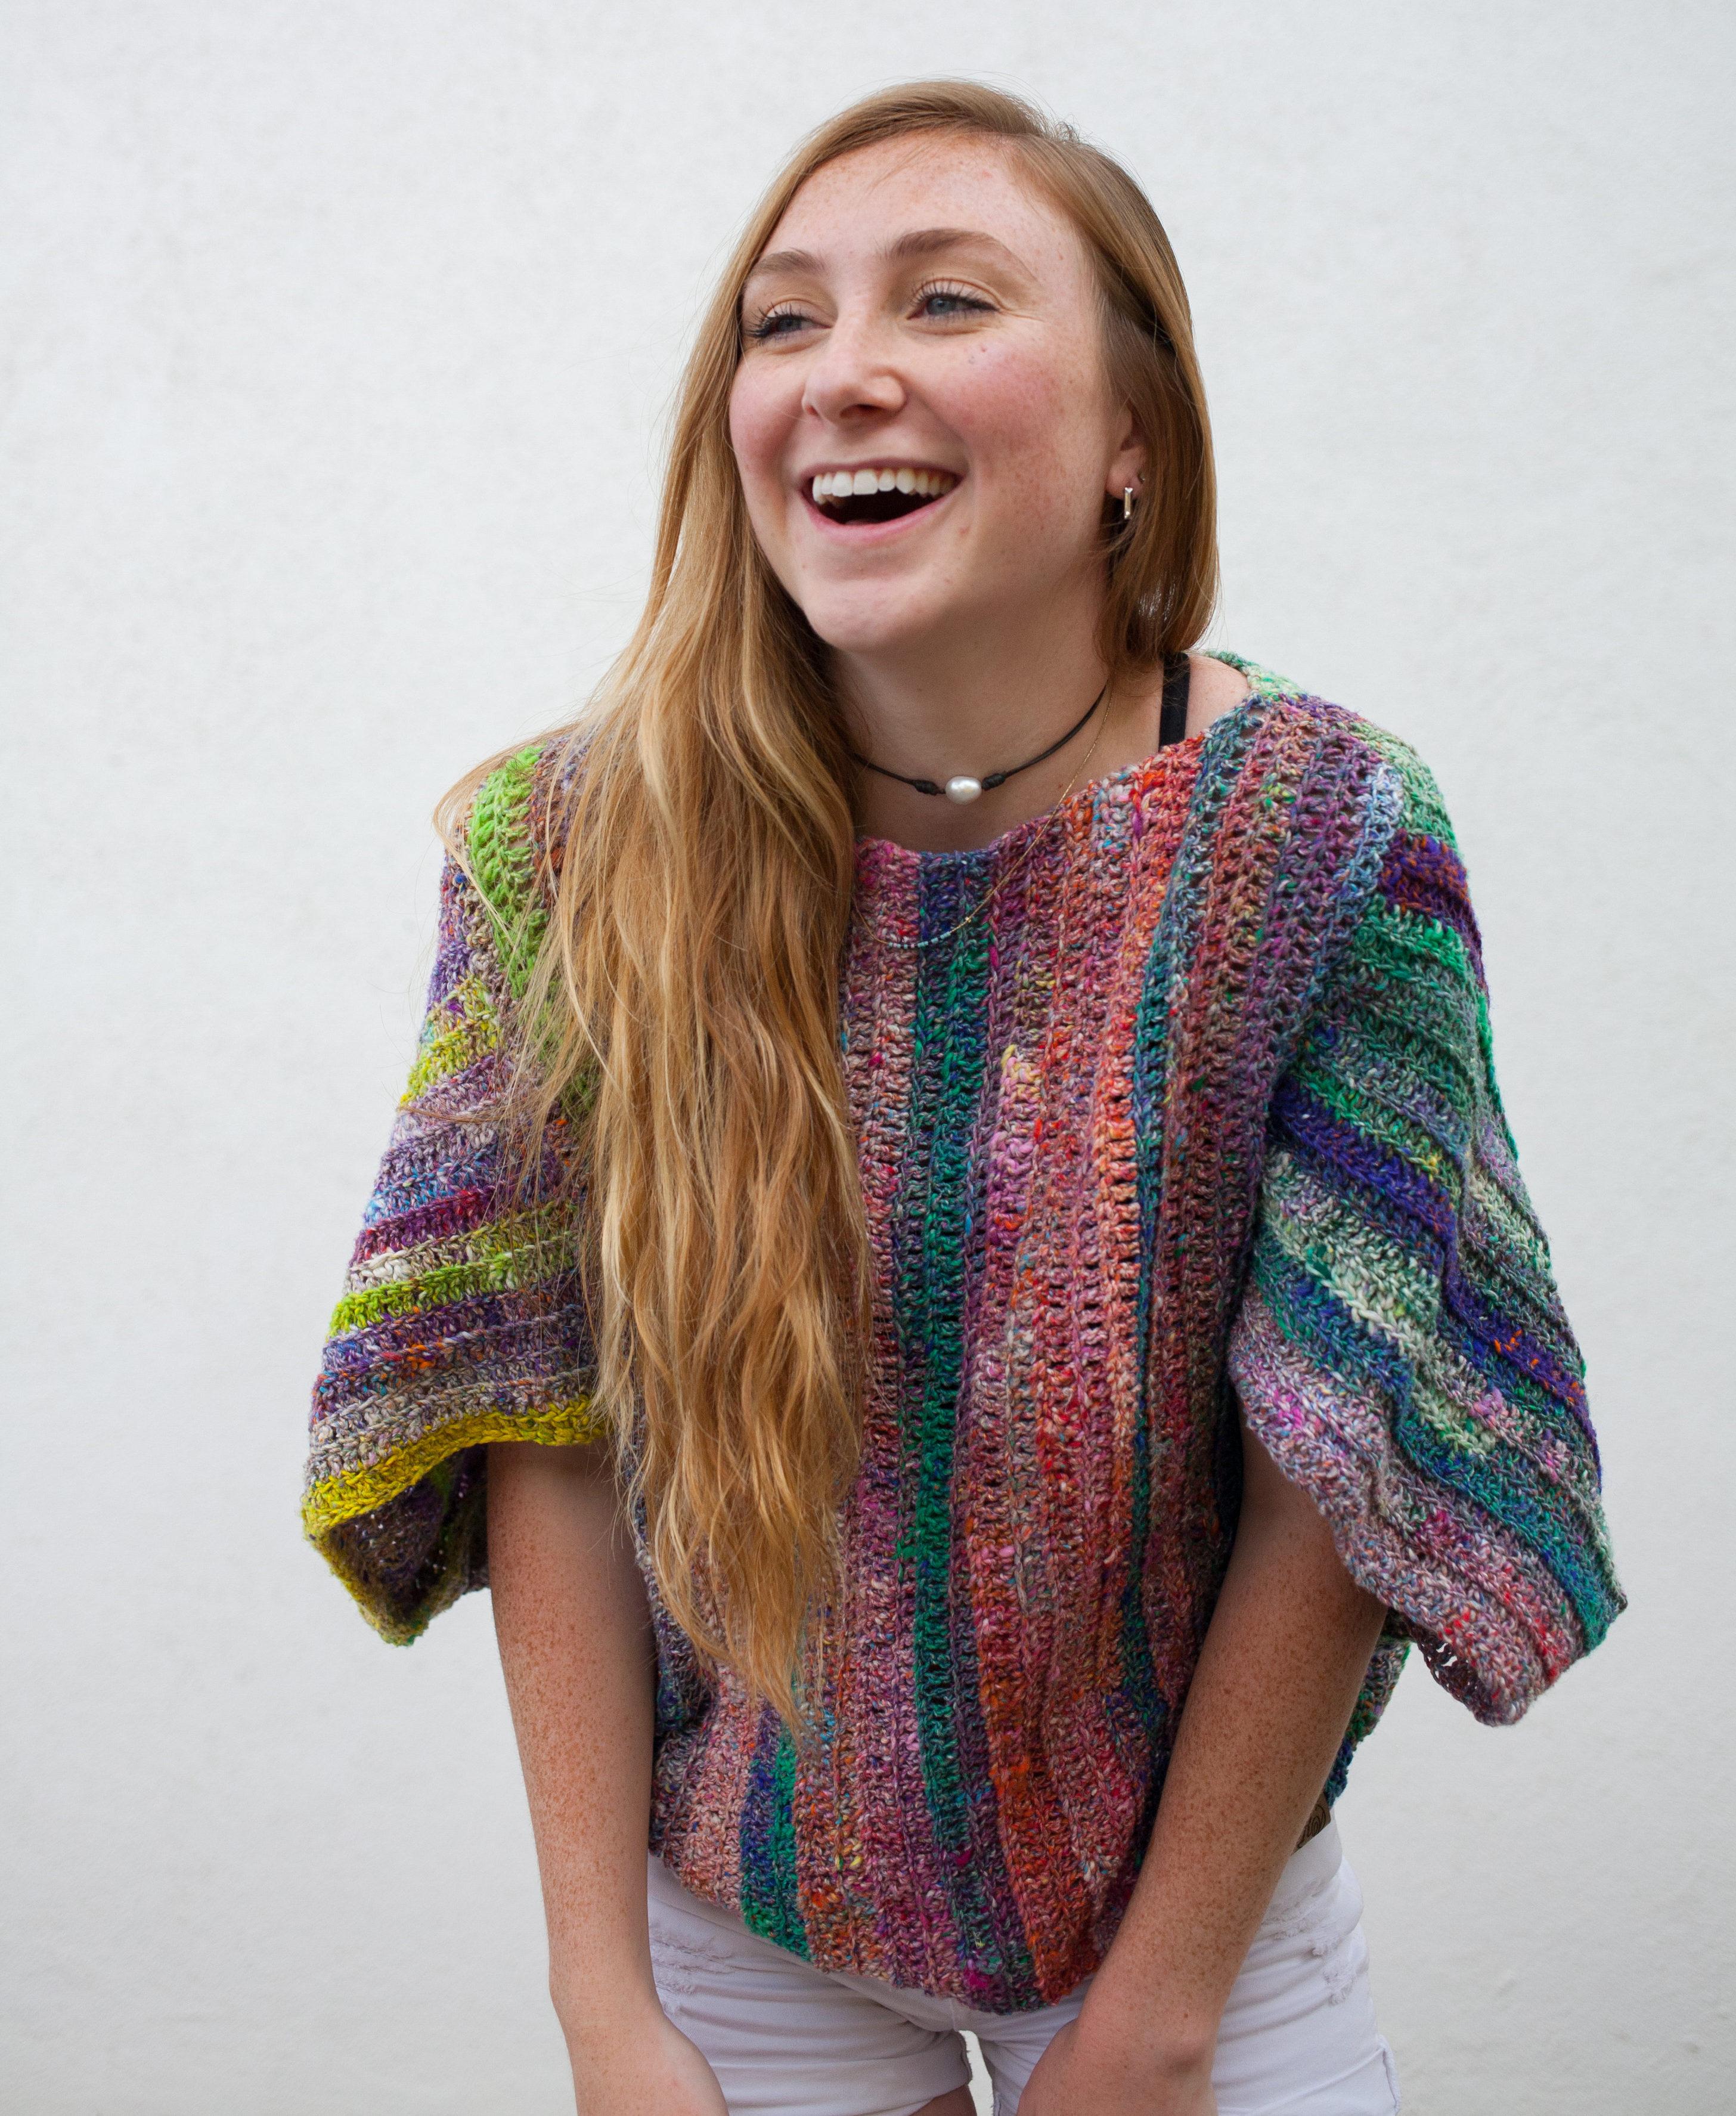 New! Spring Crochet Top Pattern